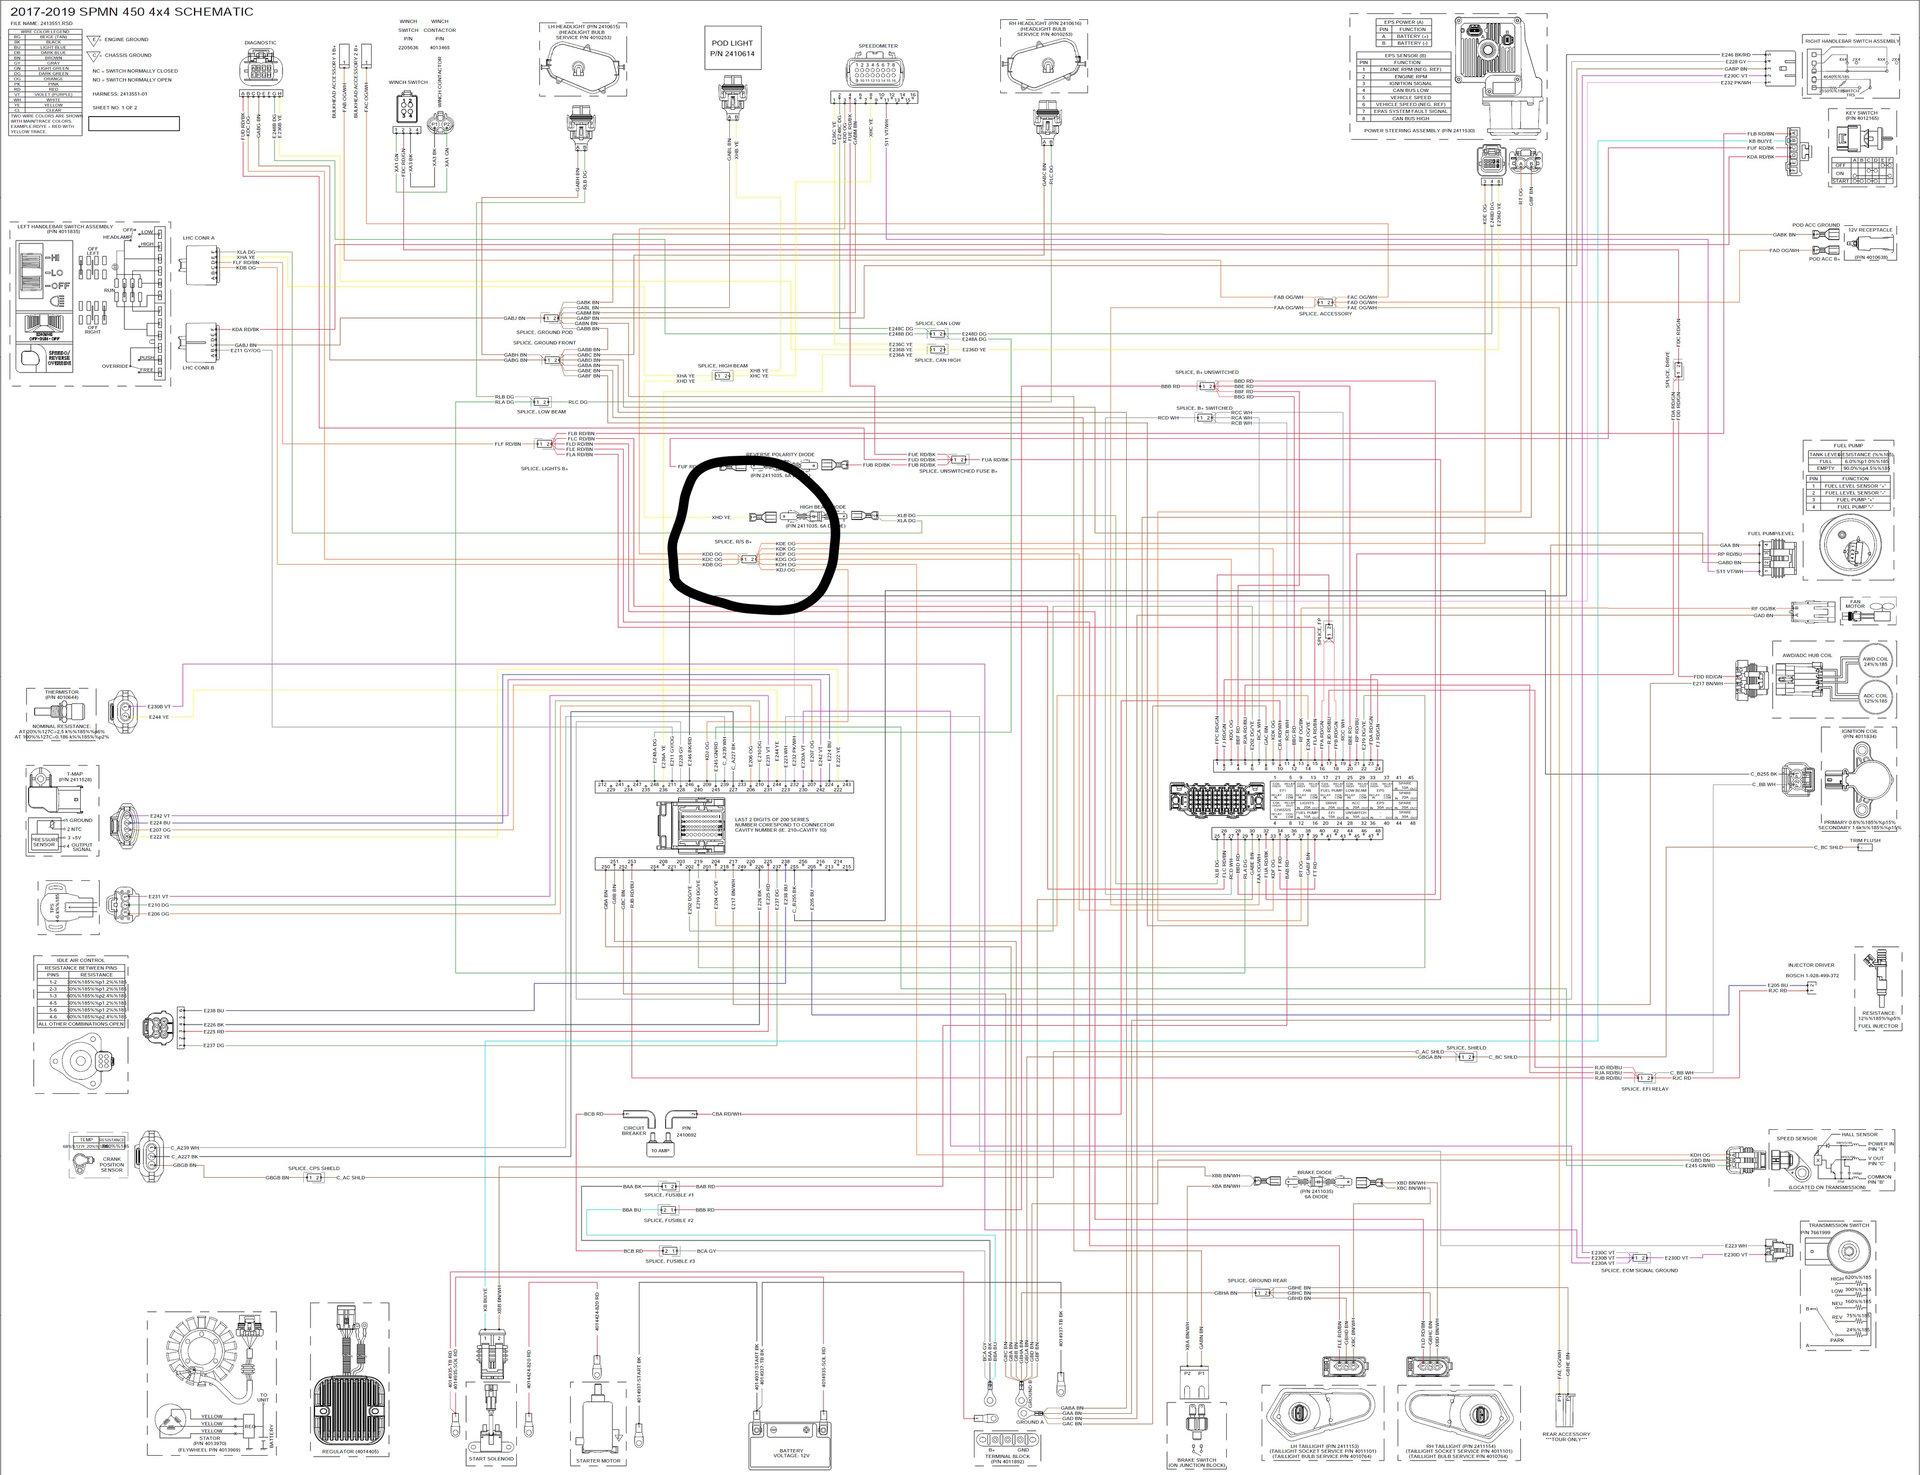 can't find wiring splice location   Polaris ATV Forum   Splice Wiring Diagram      Polaris ATV Forum